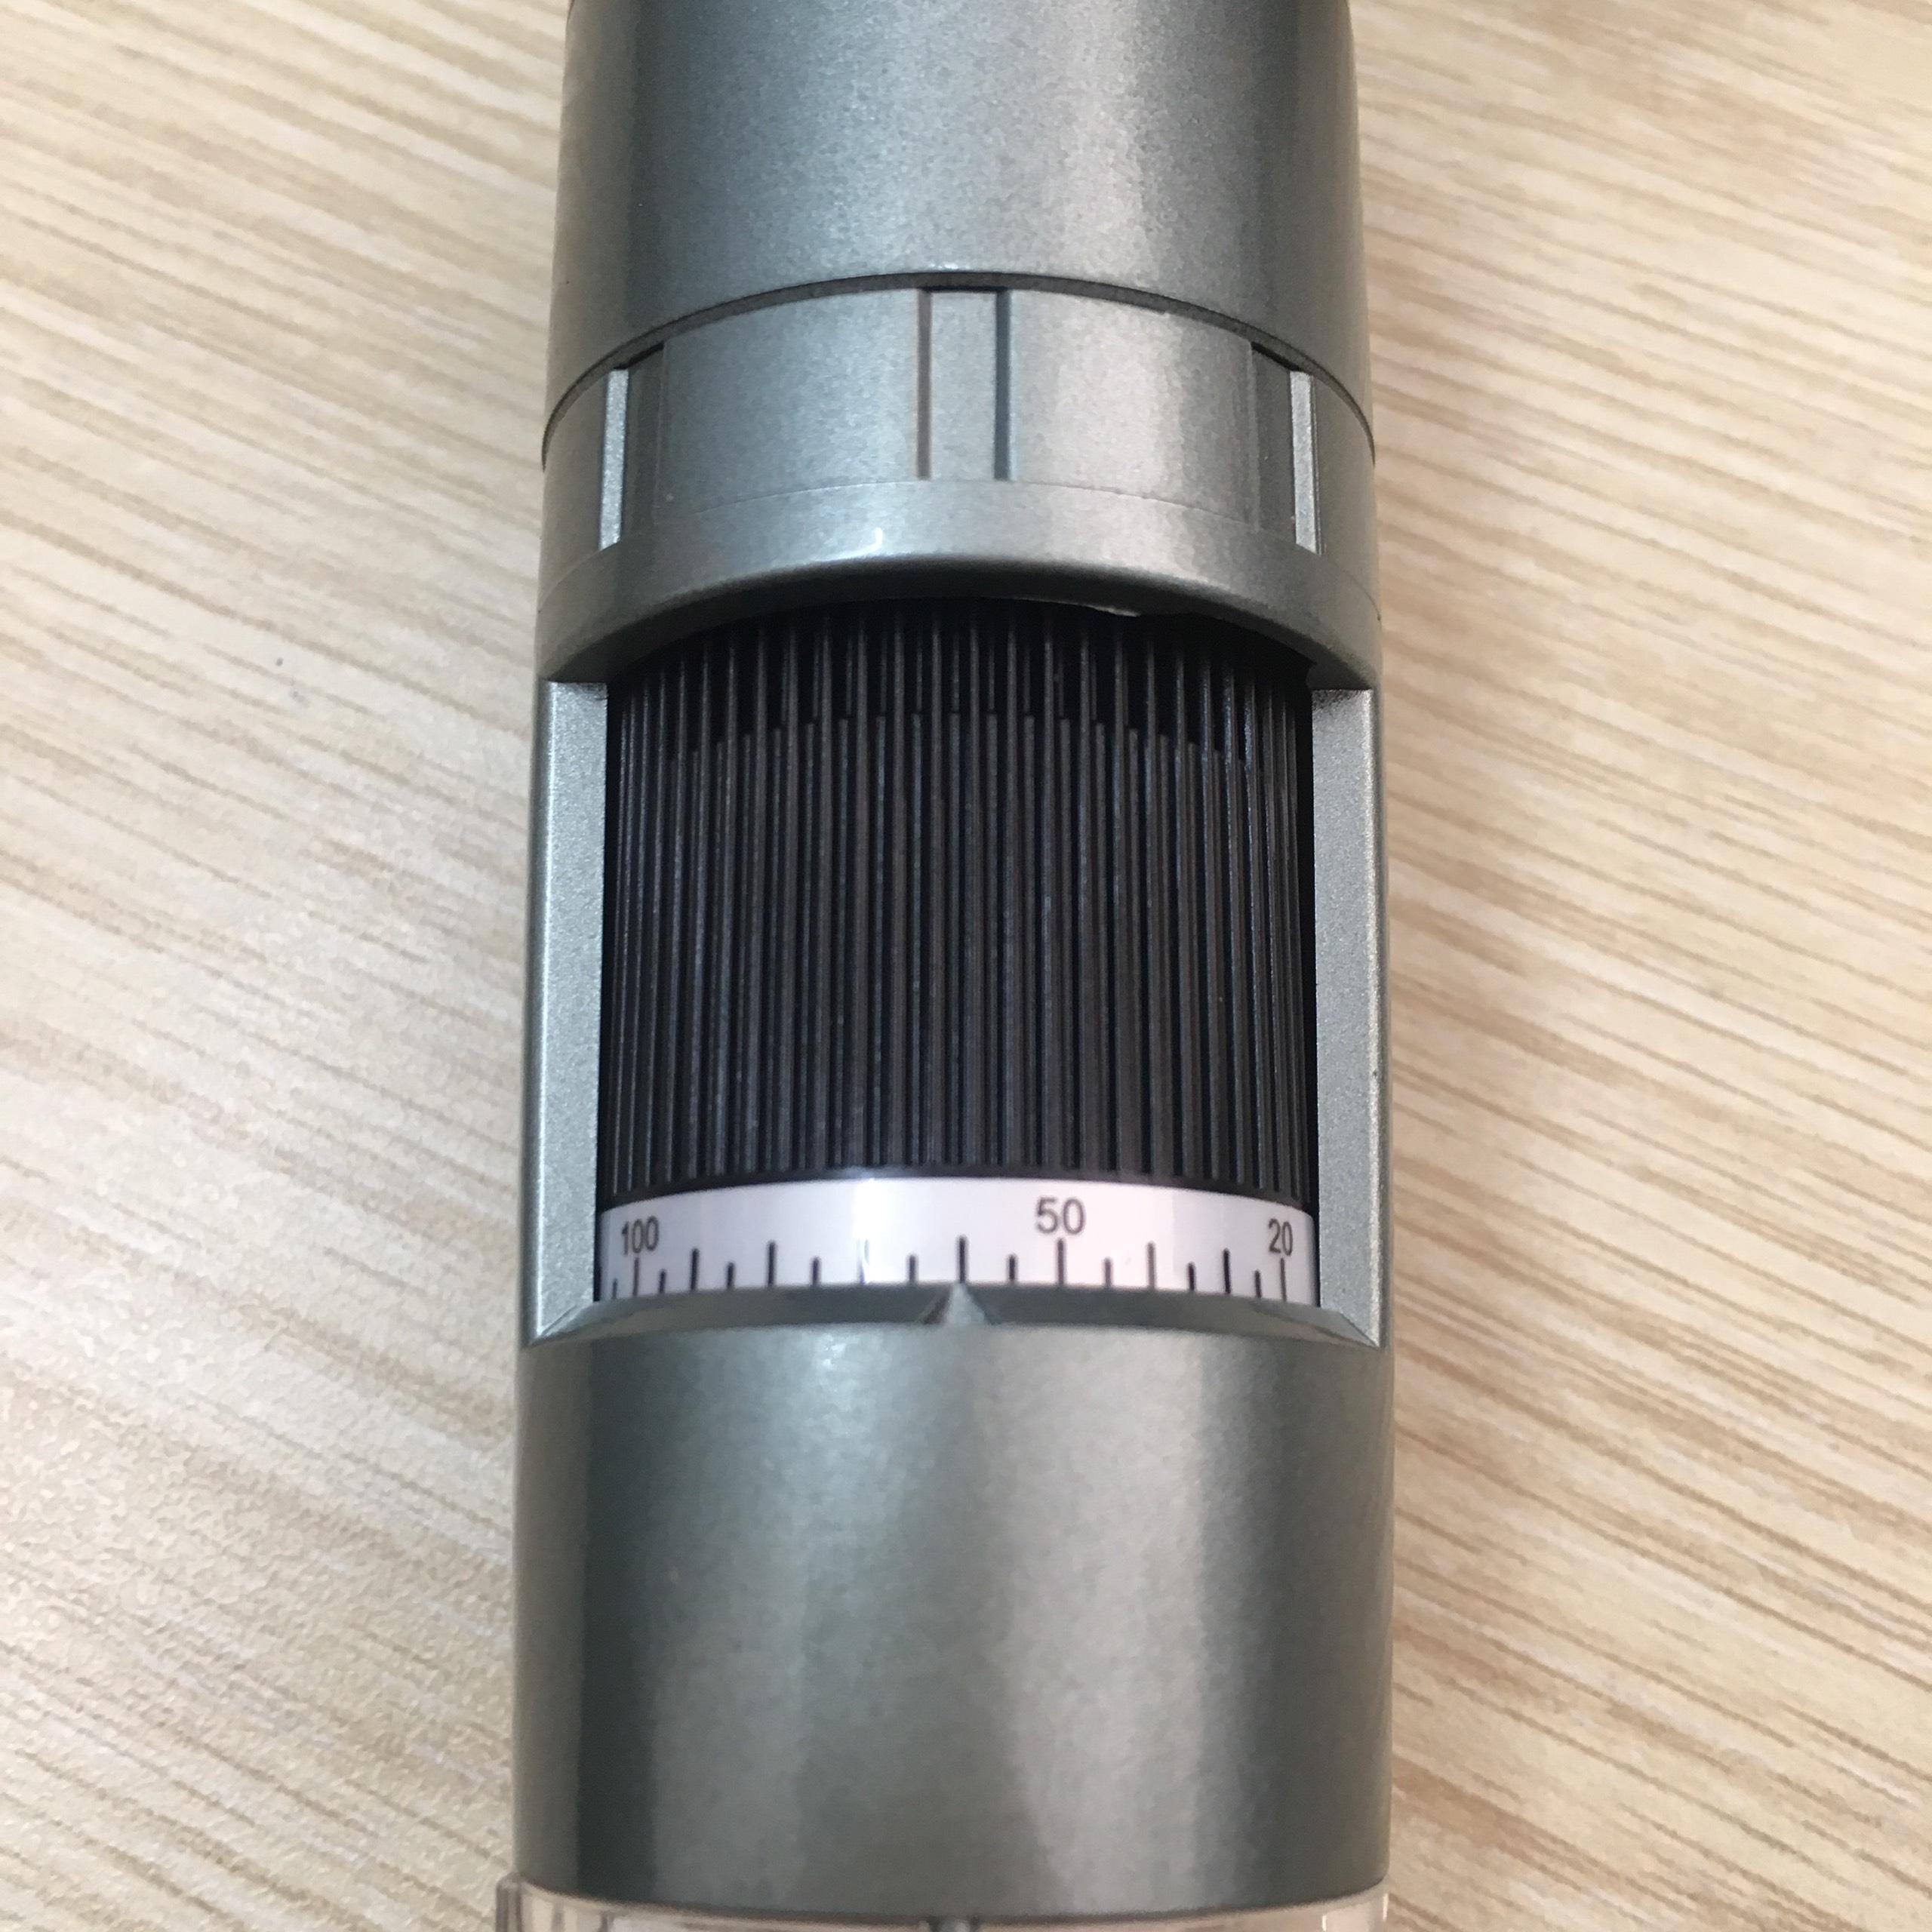 Handheld digital microscope 10x - 50x, 230x AM3113T Dino-lite